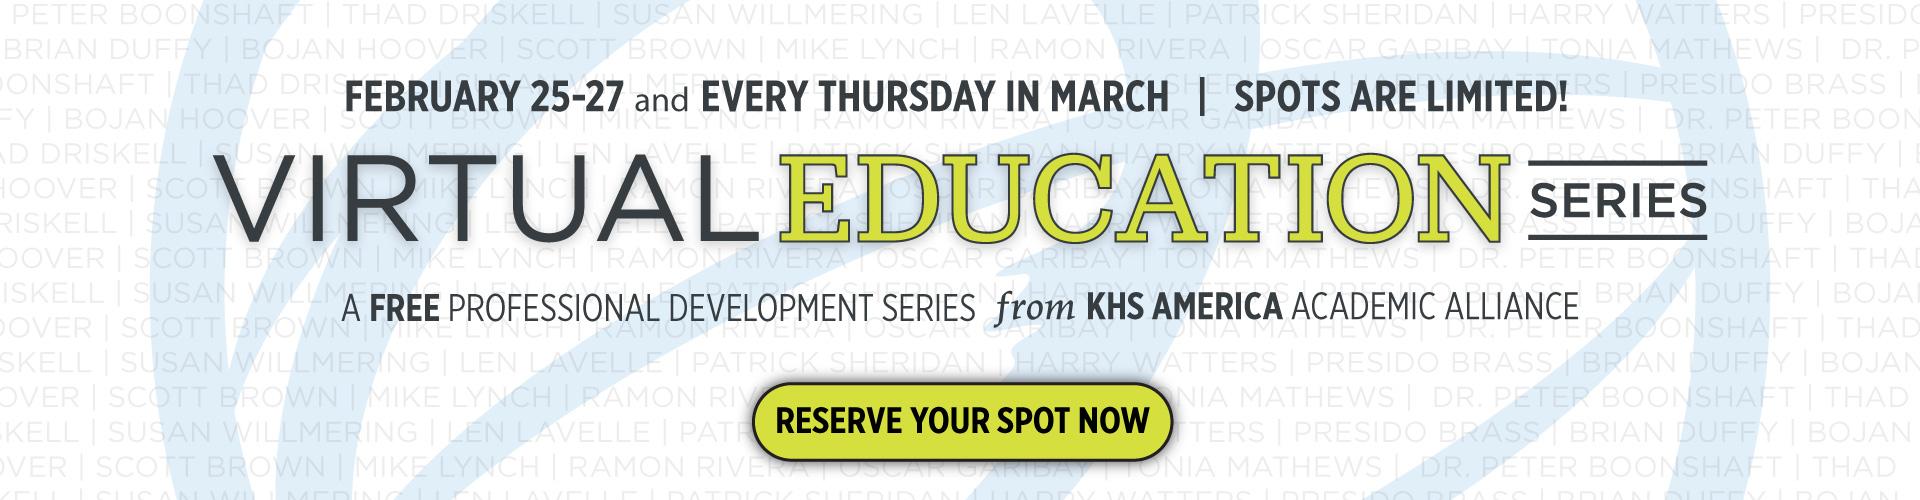 2021 Virtual Education Series